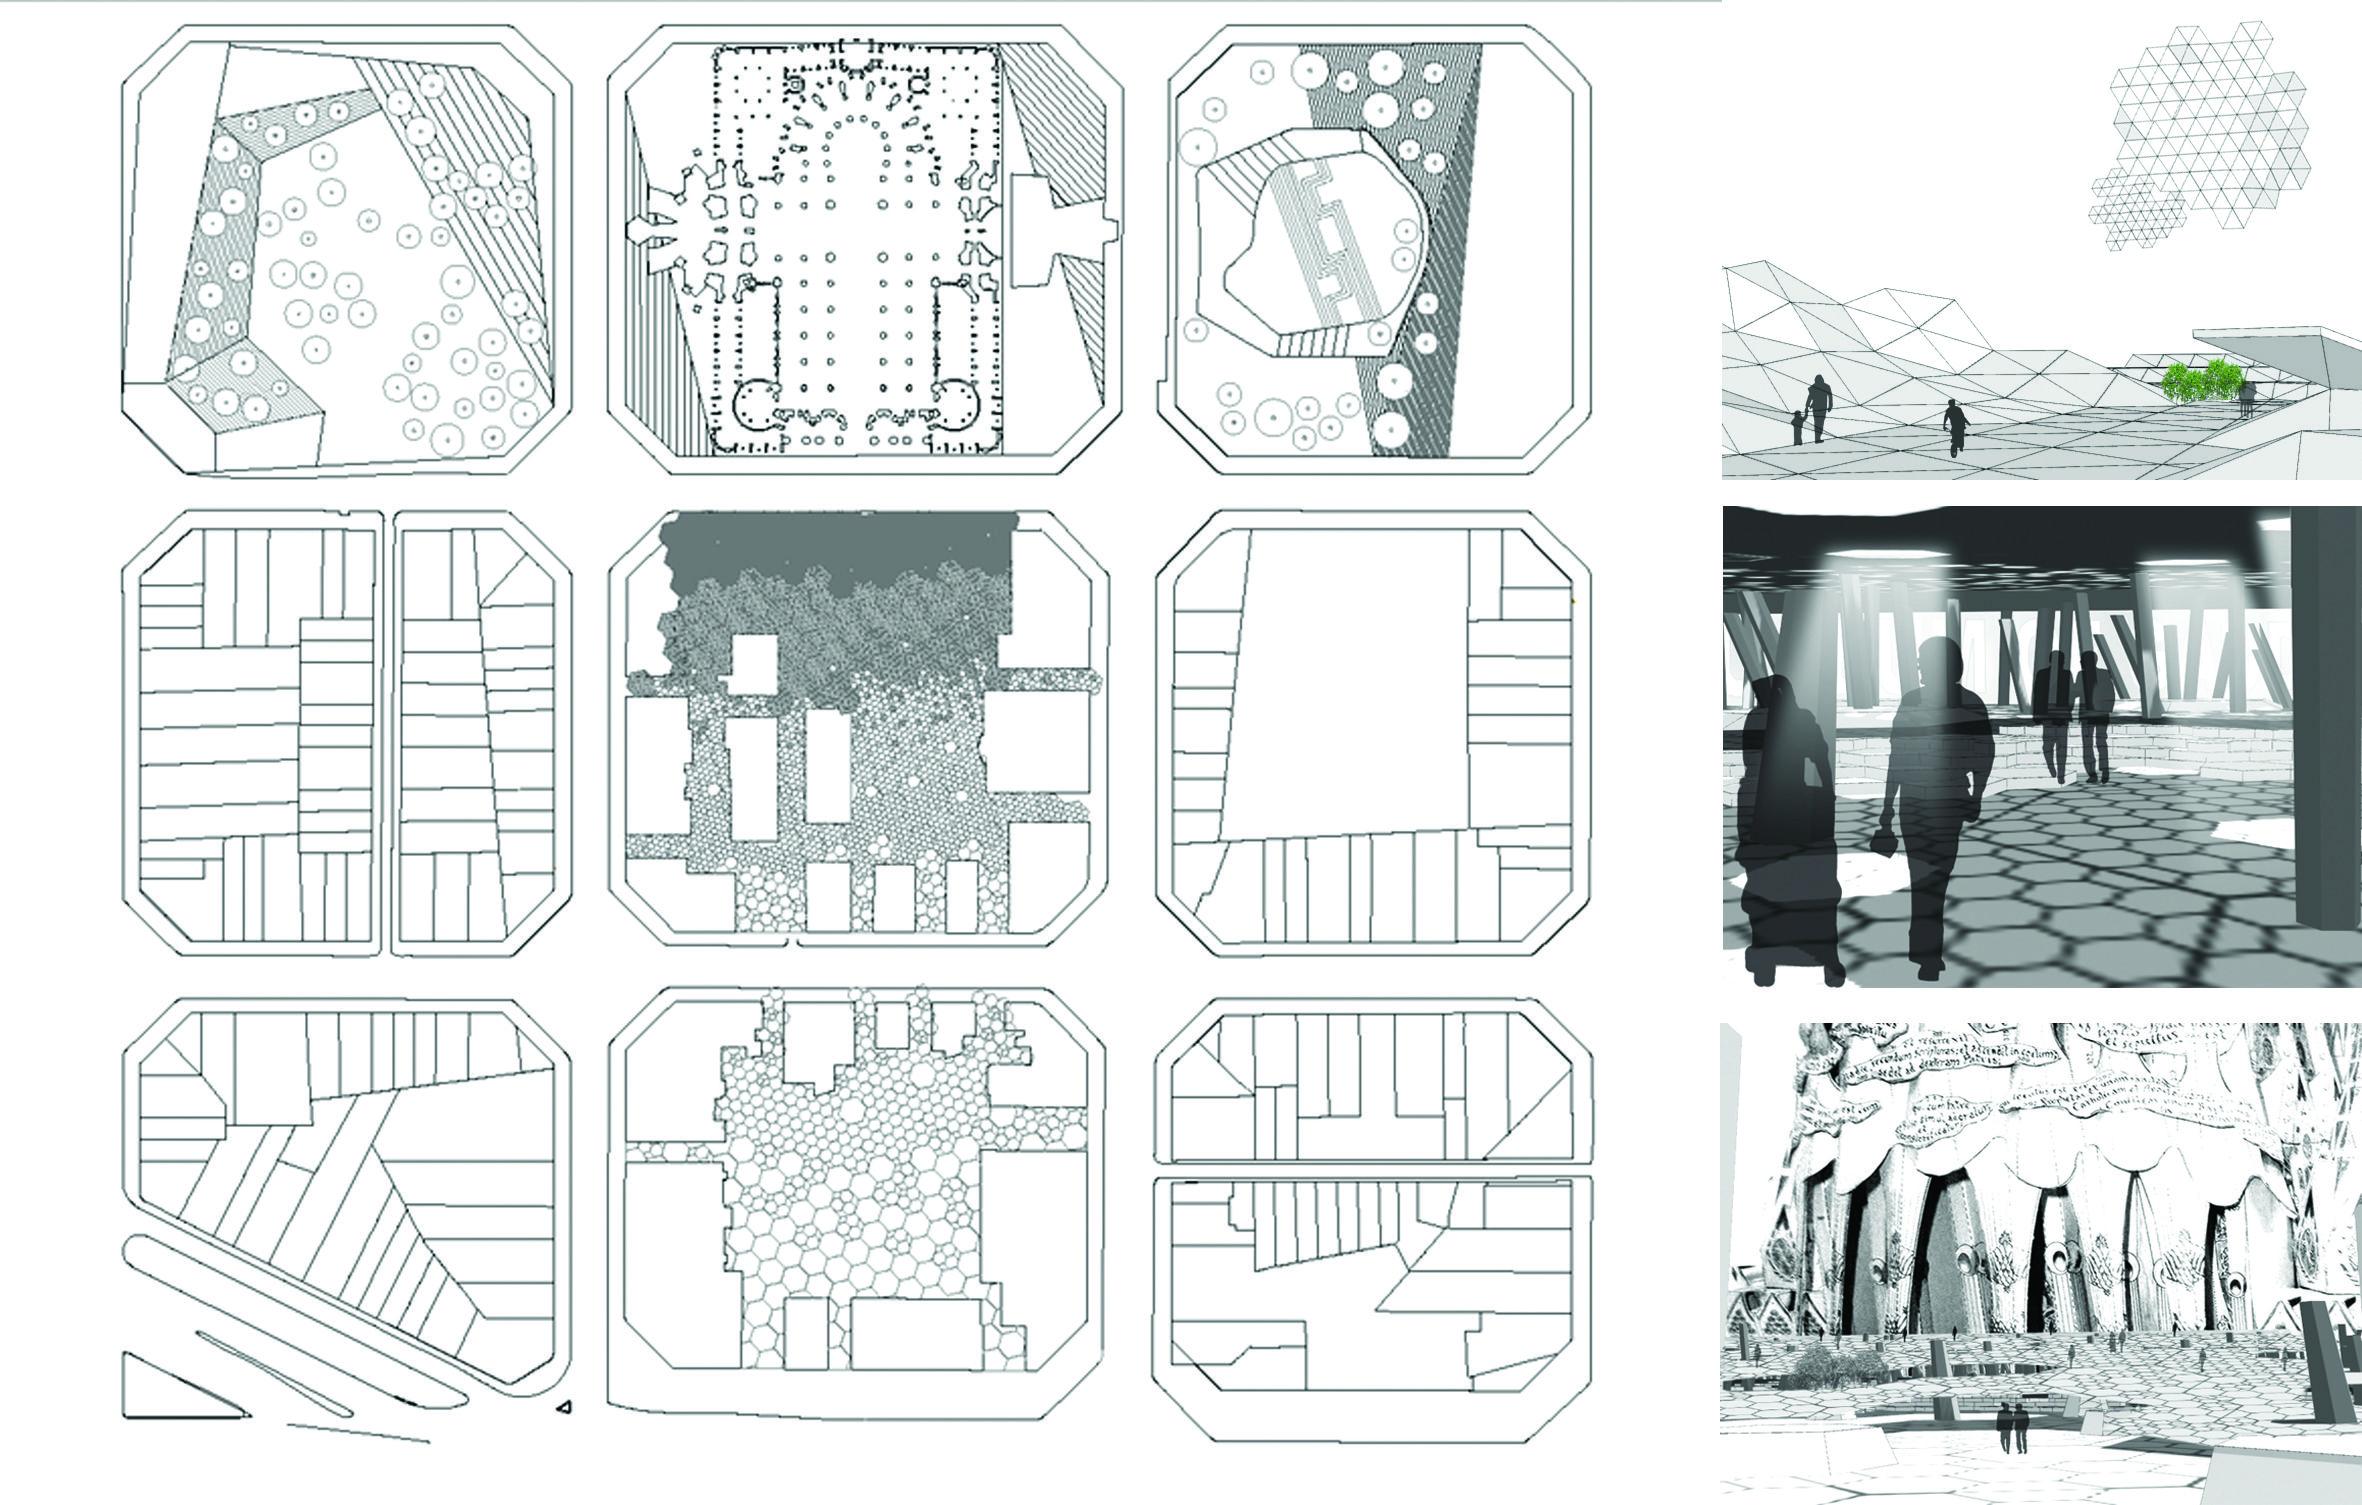 Carte Eixample Barcelone.Barcelona Plan Urban Plan Google Search Urban Planning